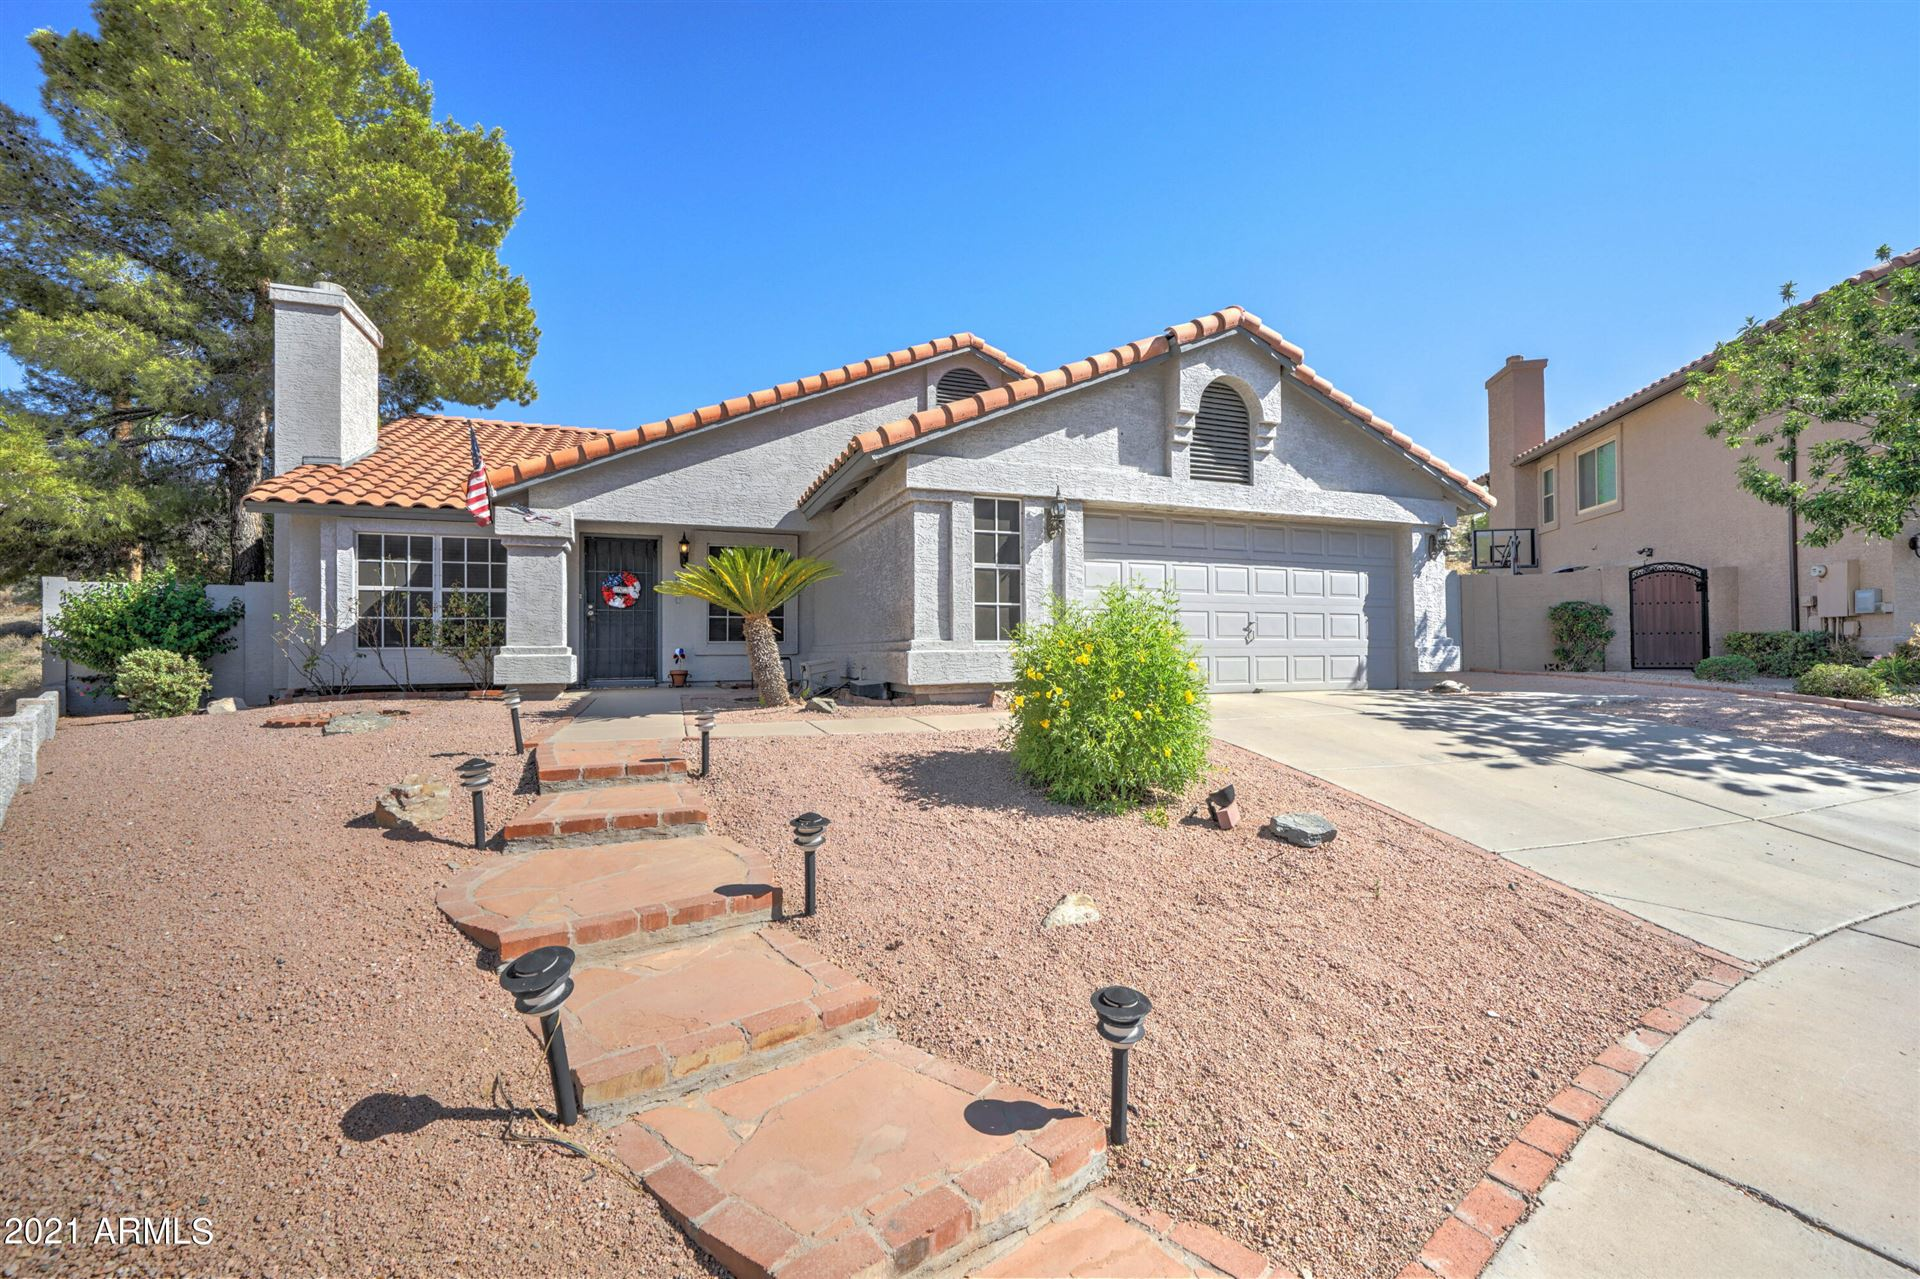 Photo of 15439 S 23RD Street, Phoenix, AZ 85048 (MLS # 6250051)